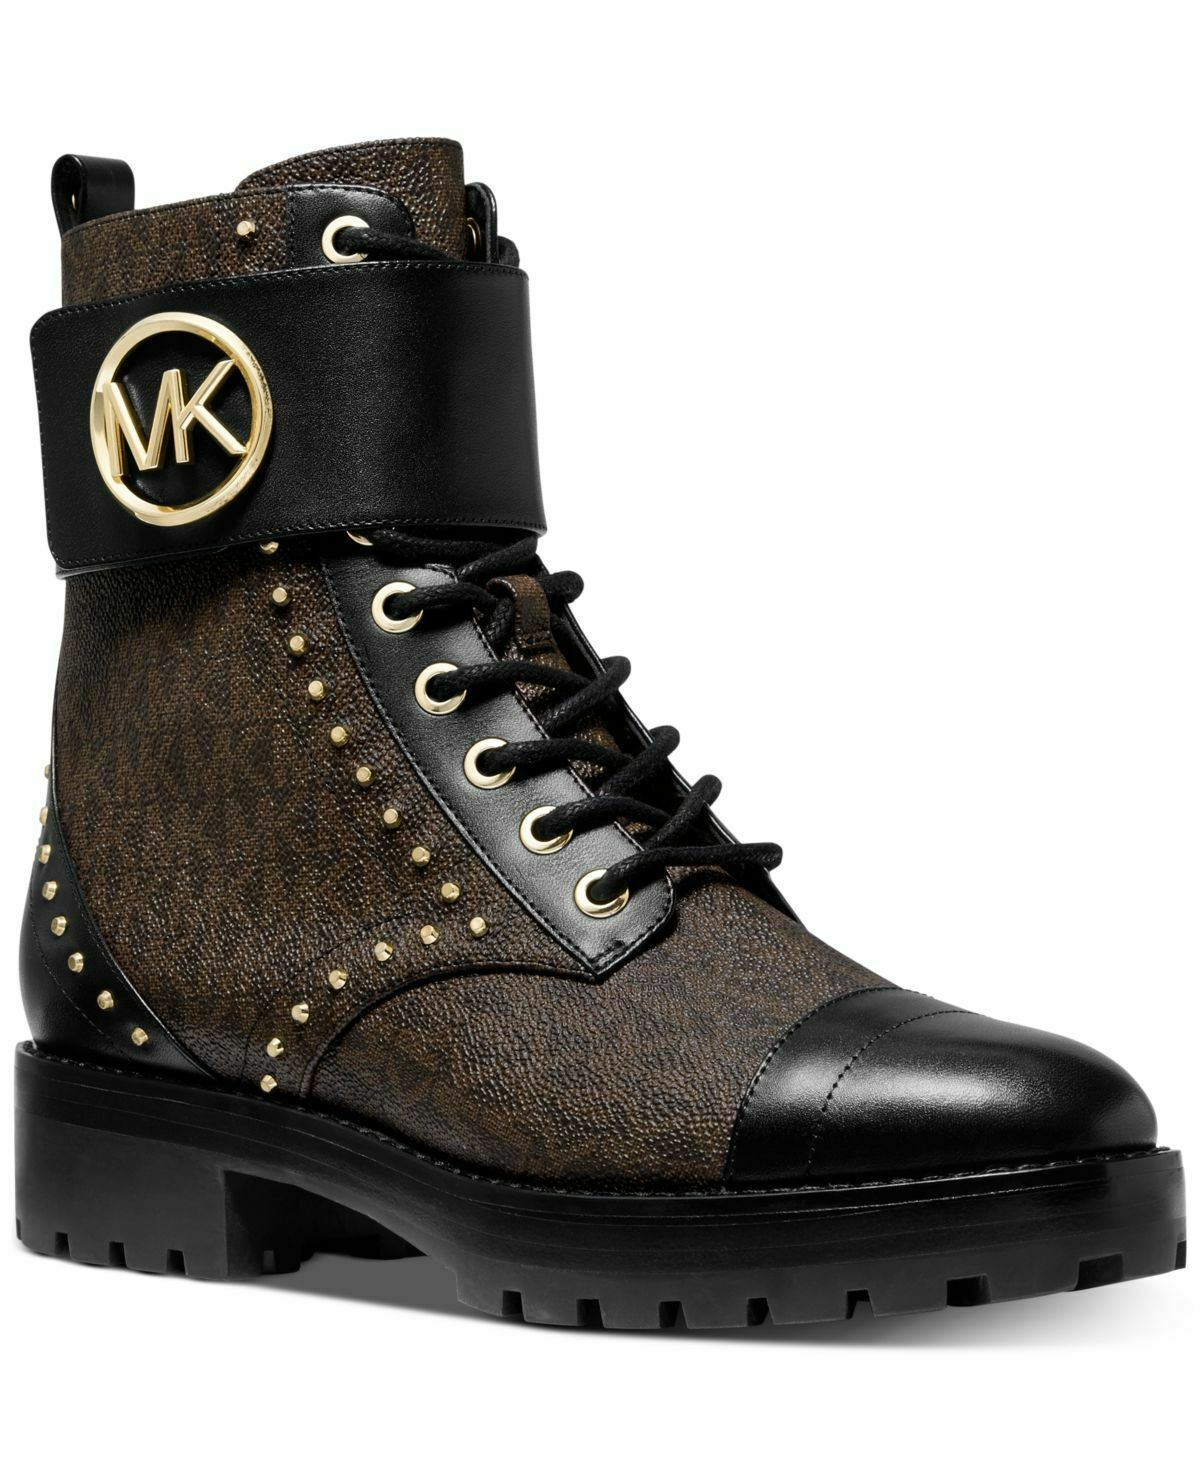 Michael Kors Tatum Ankle Combat Biker Mini MK Logo Studded Boots Brown/Black